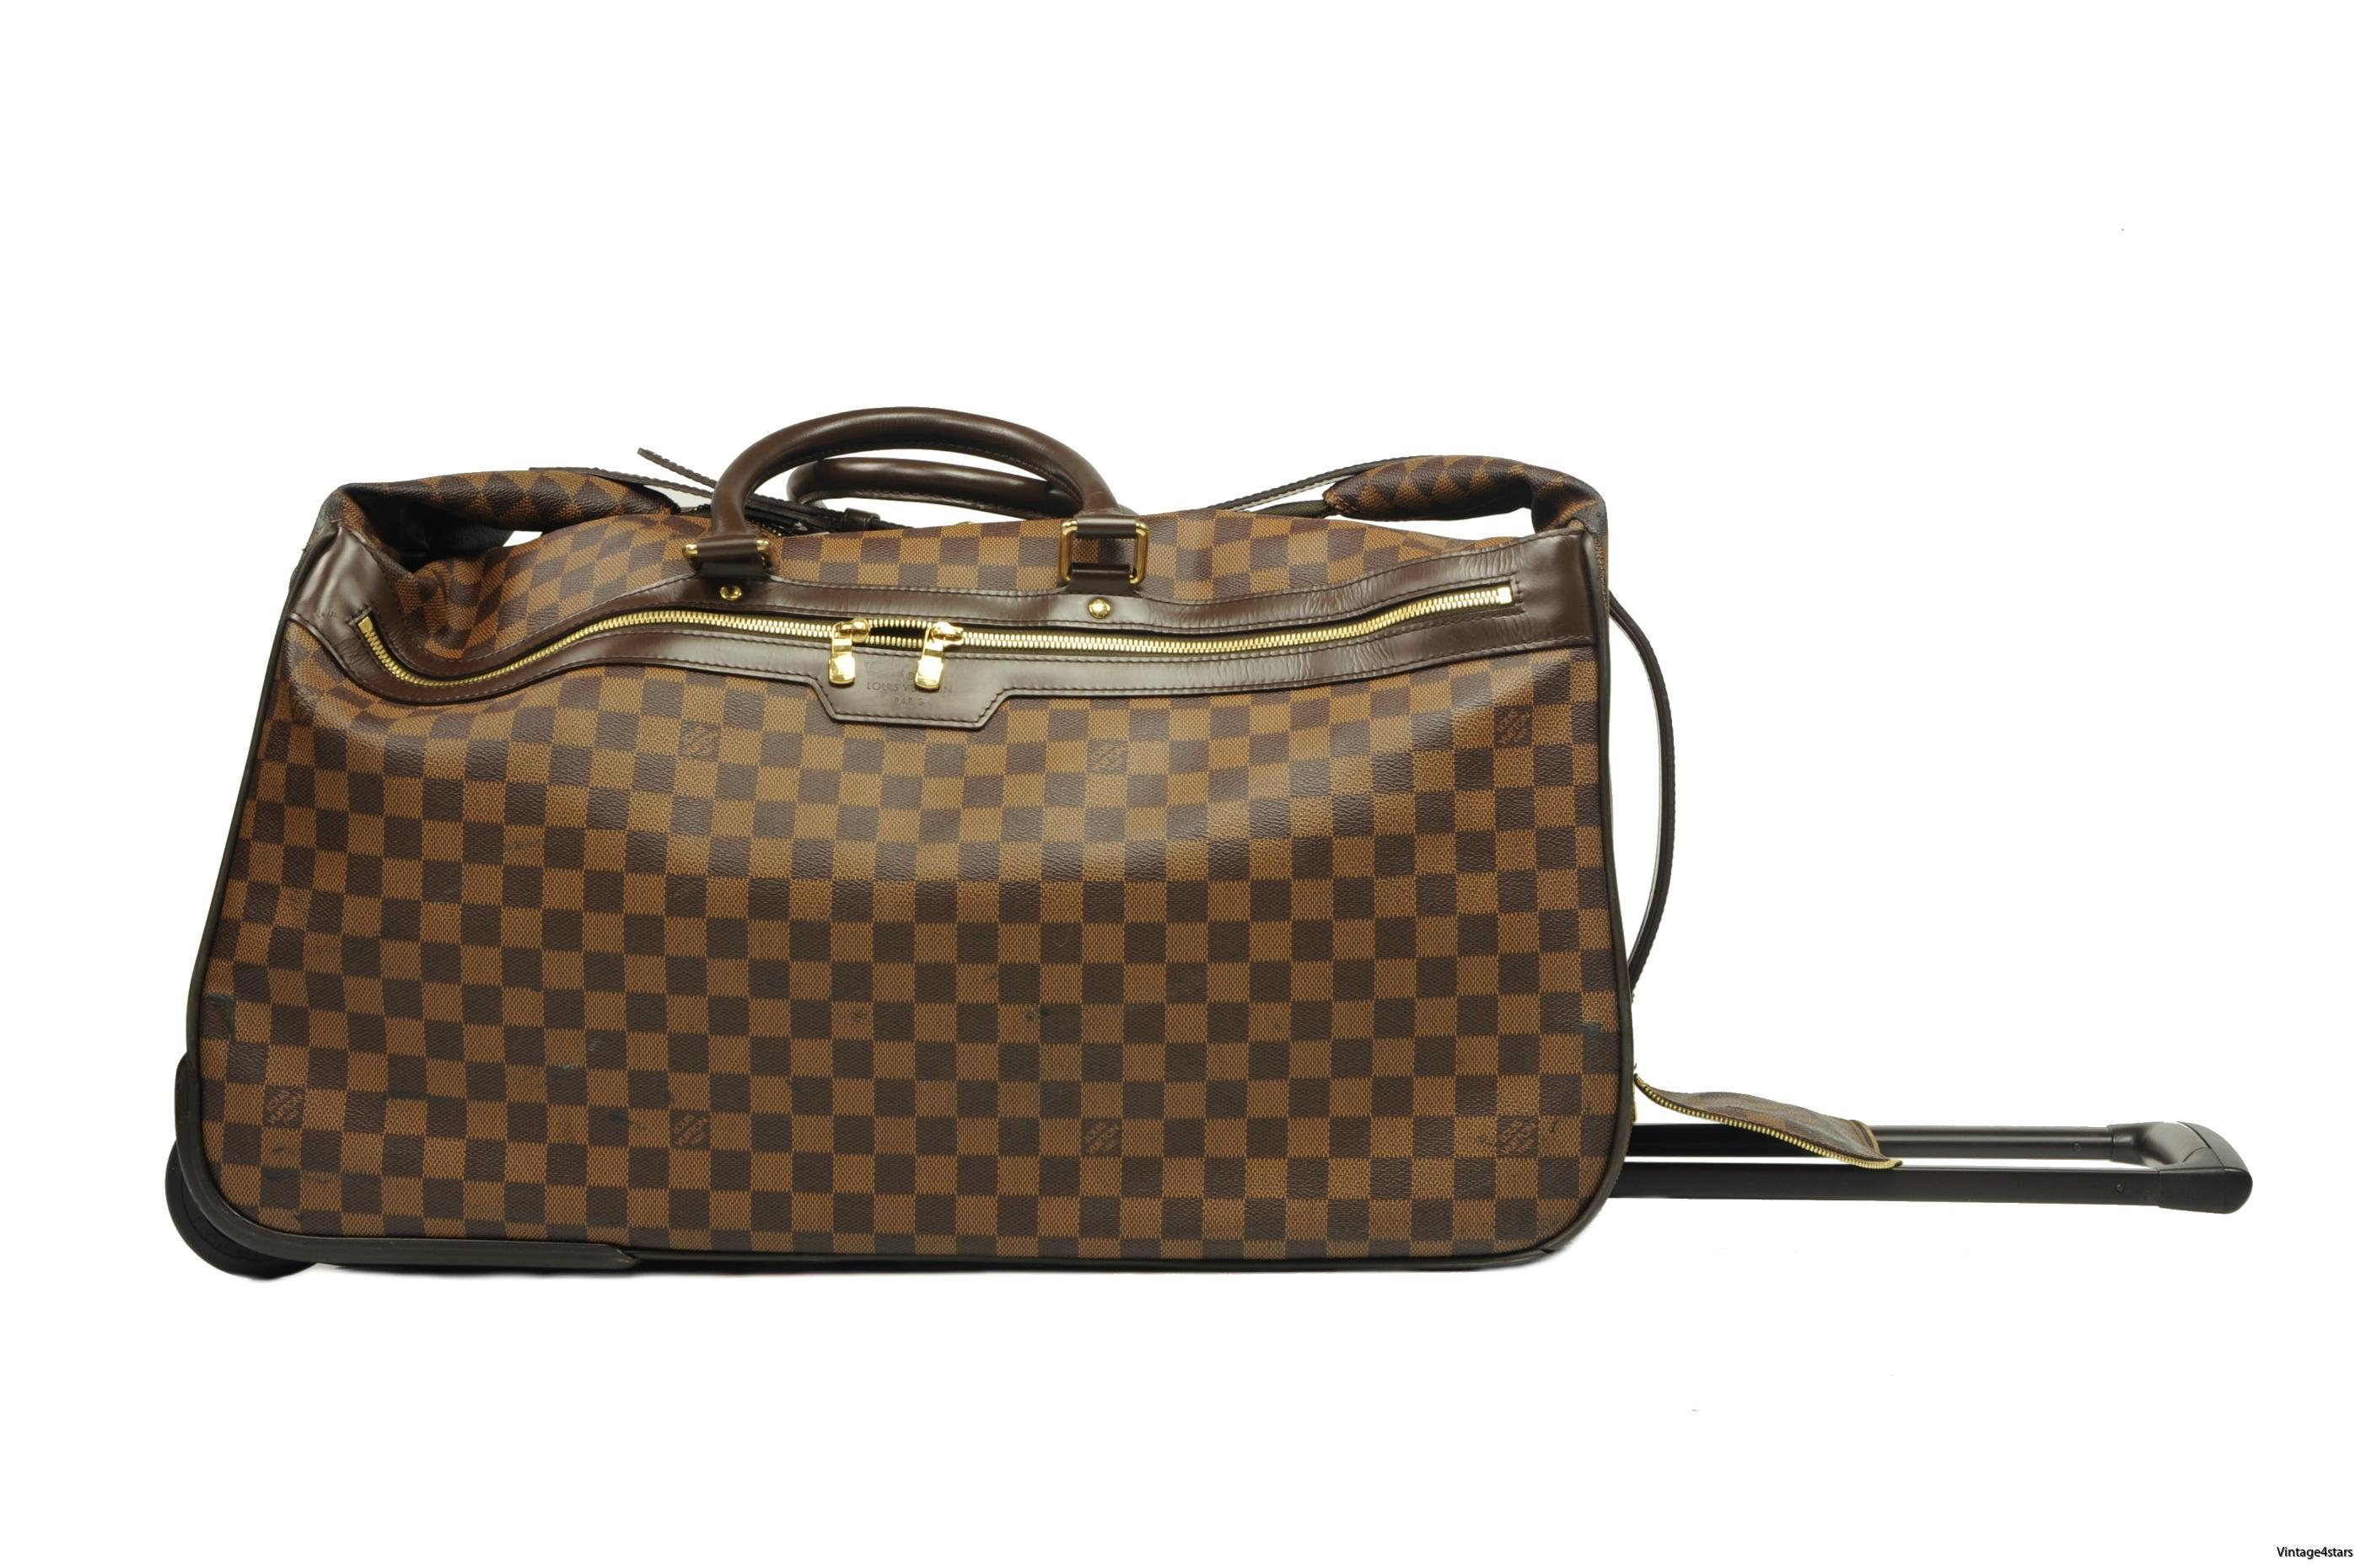 Louis Vuitton Eole 60 Damier Ebene 1